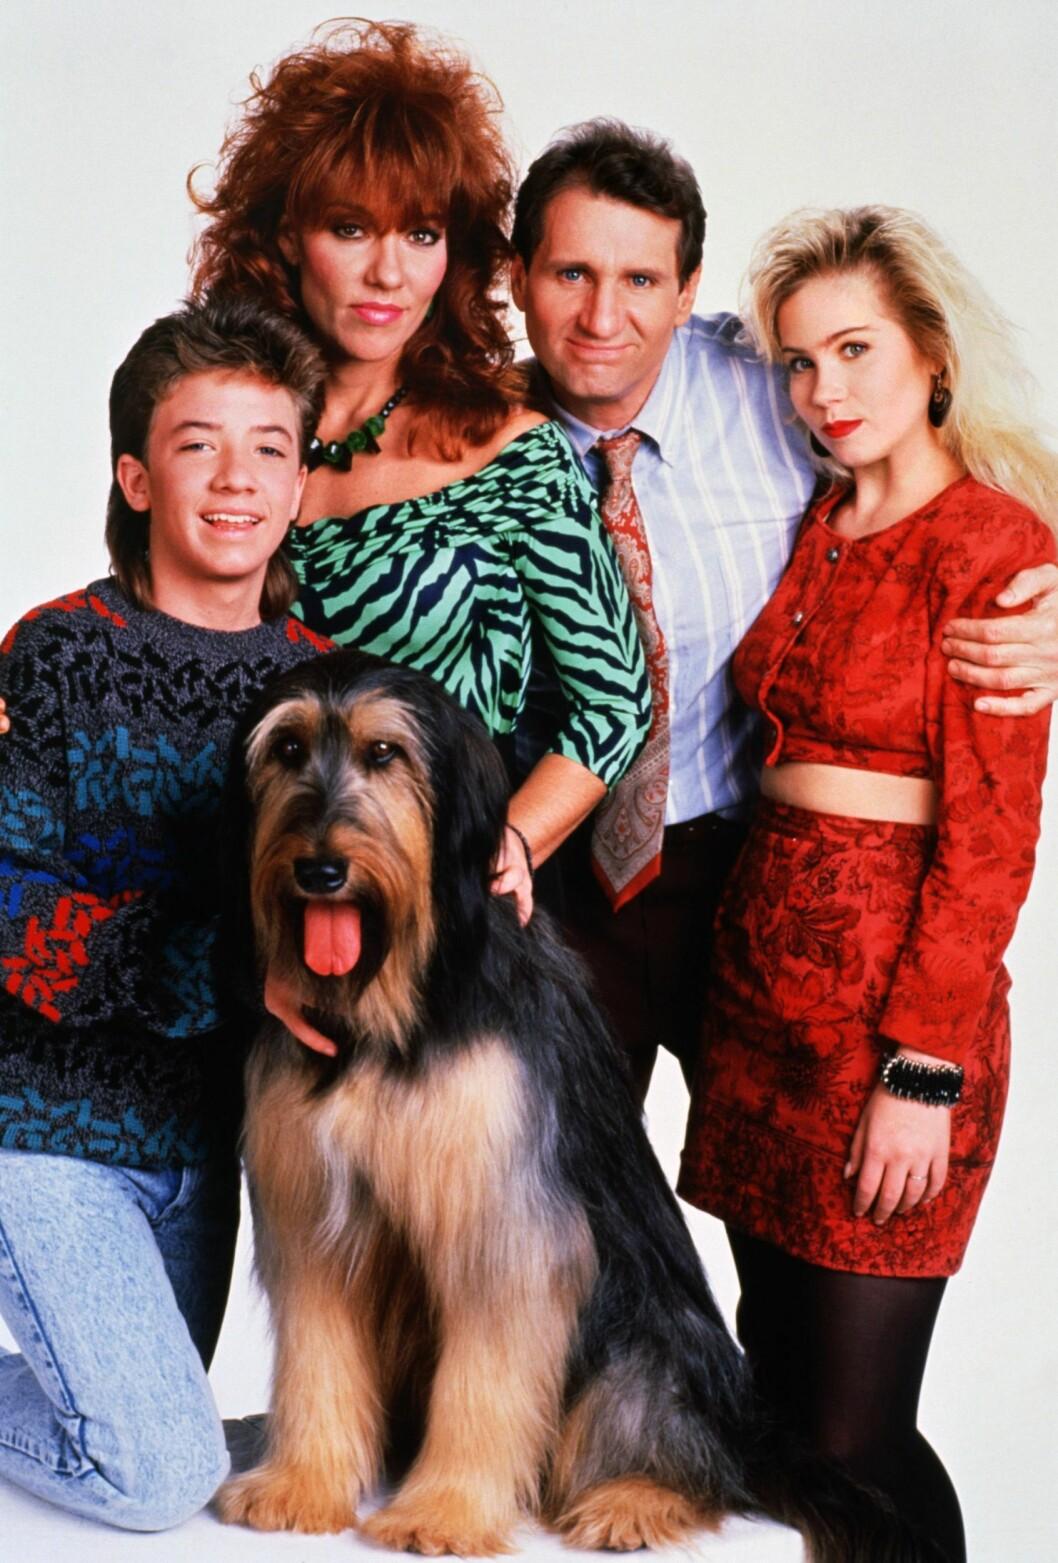 TV-STJERNER: Katey Sagal, Ed O'Neill og David Faustino og Christina Applegate gjorde stor suksess på 80- og 90-tallet med sine roller i TV-serien «Våre verste år».  Foto: COLUMBIA PICTURES TELEVISION / Album